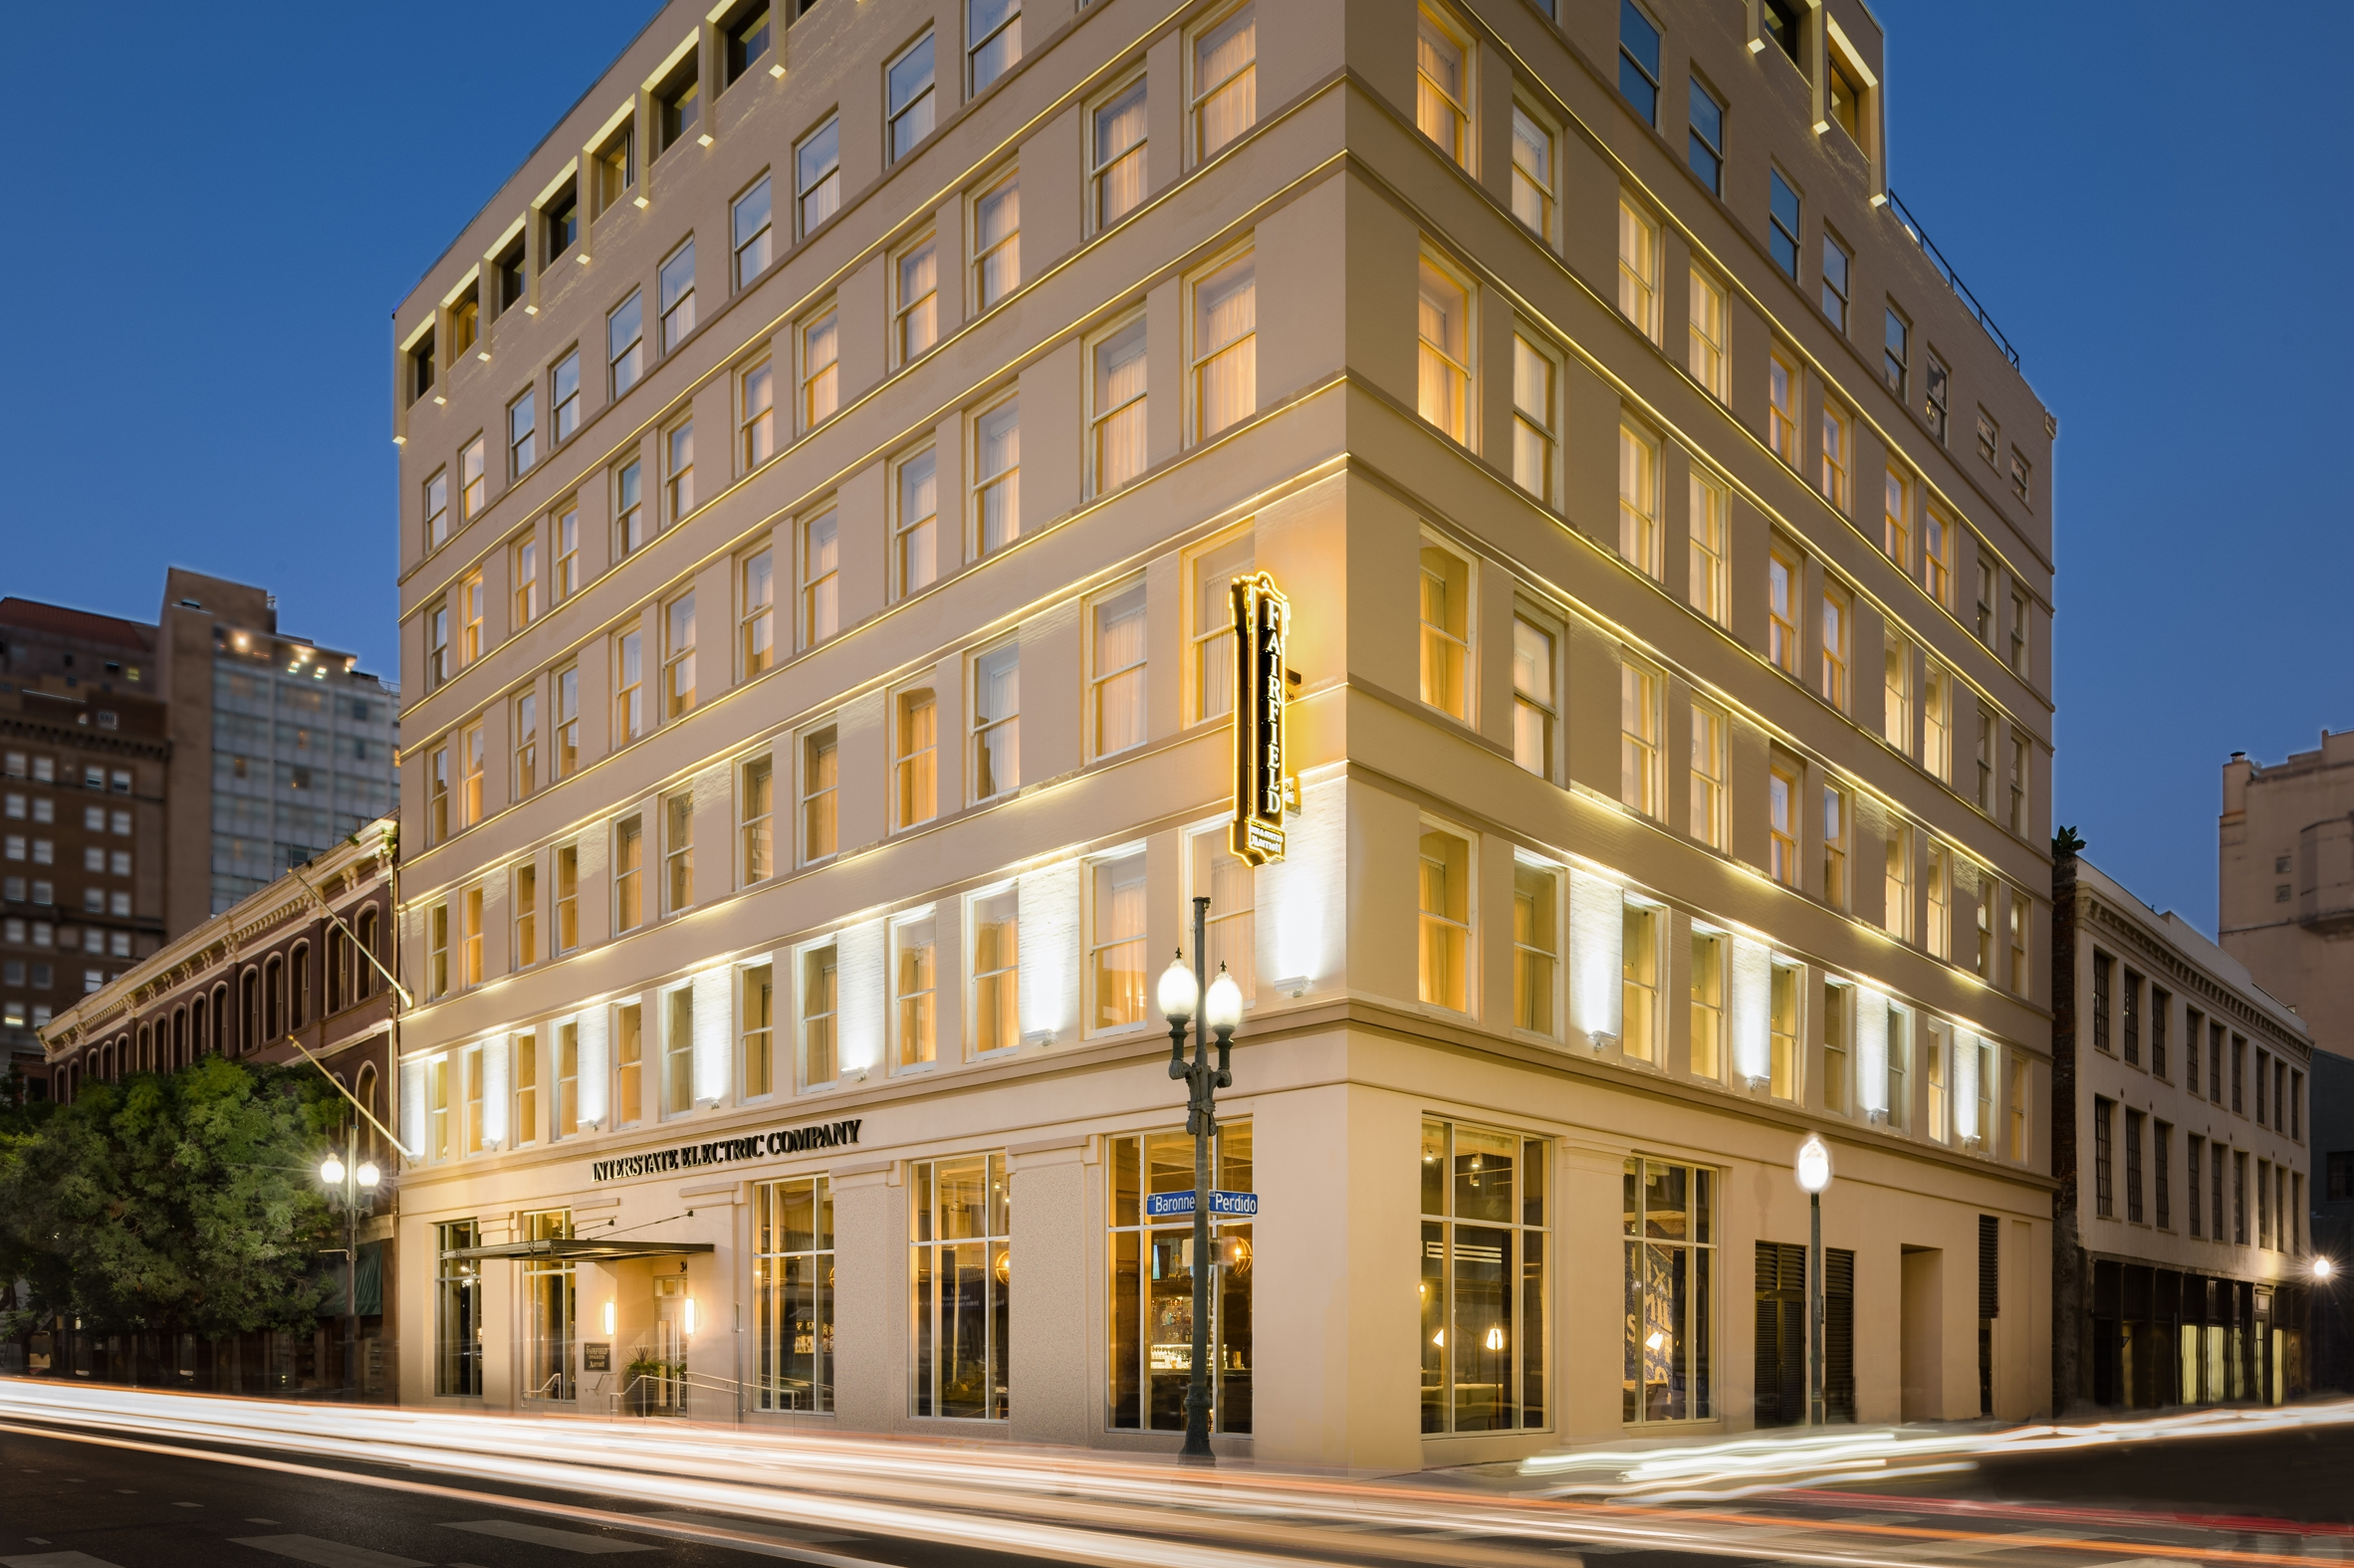 Fairfield Inn & Suites New Orleans exterior